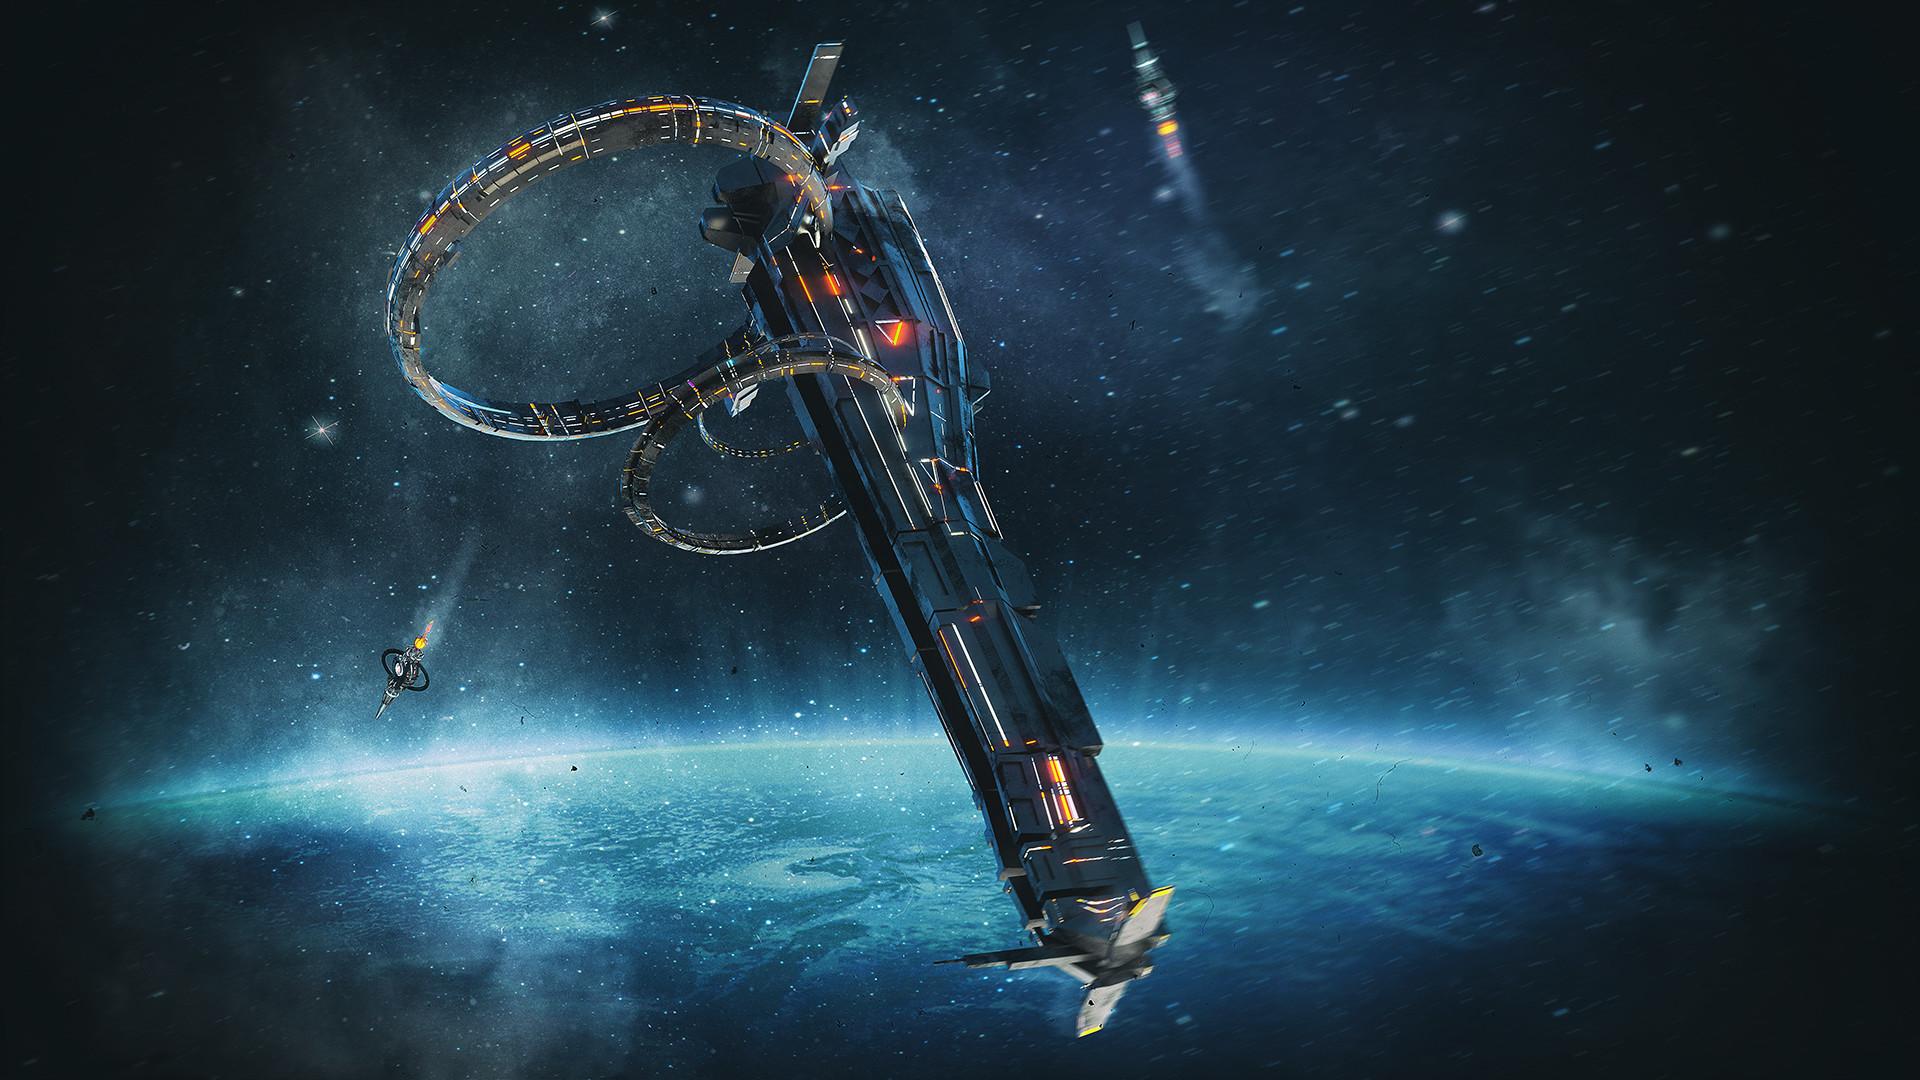 Kresimir jelusic 103 200116 space station